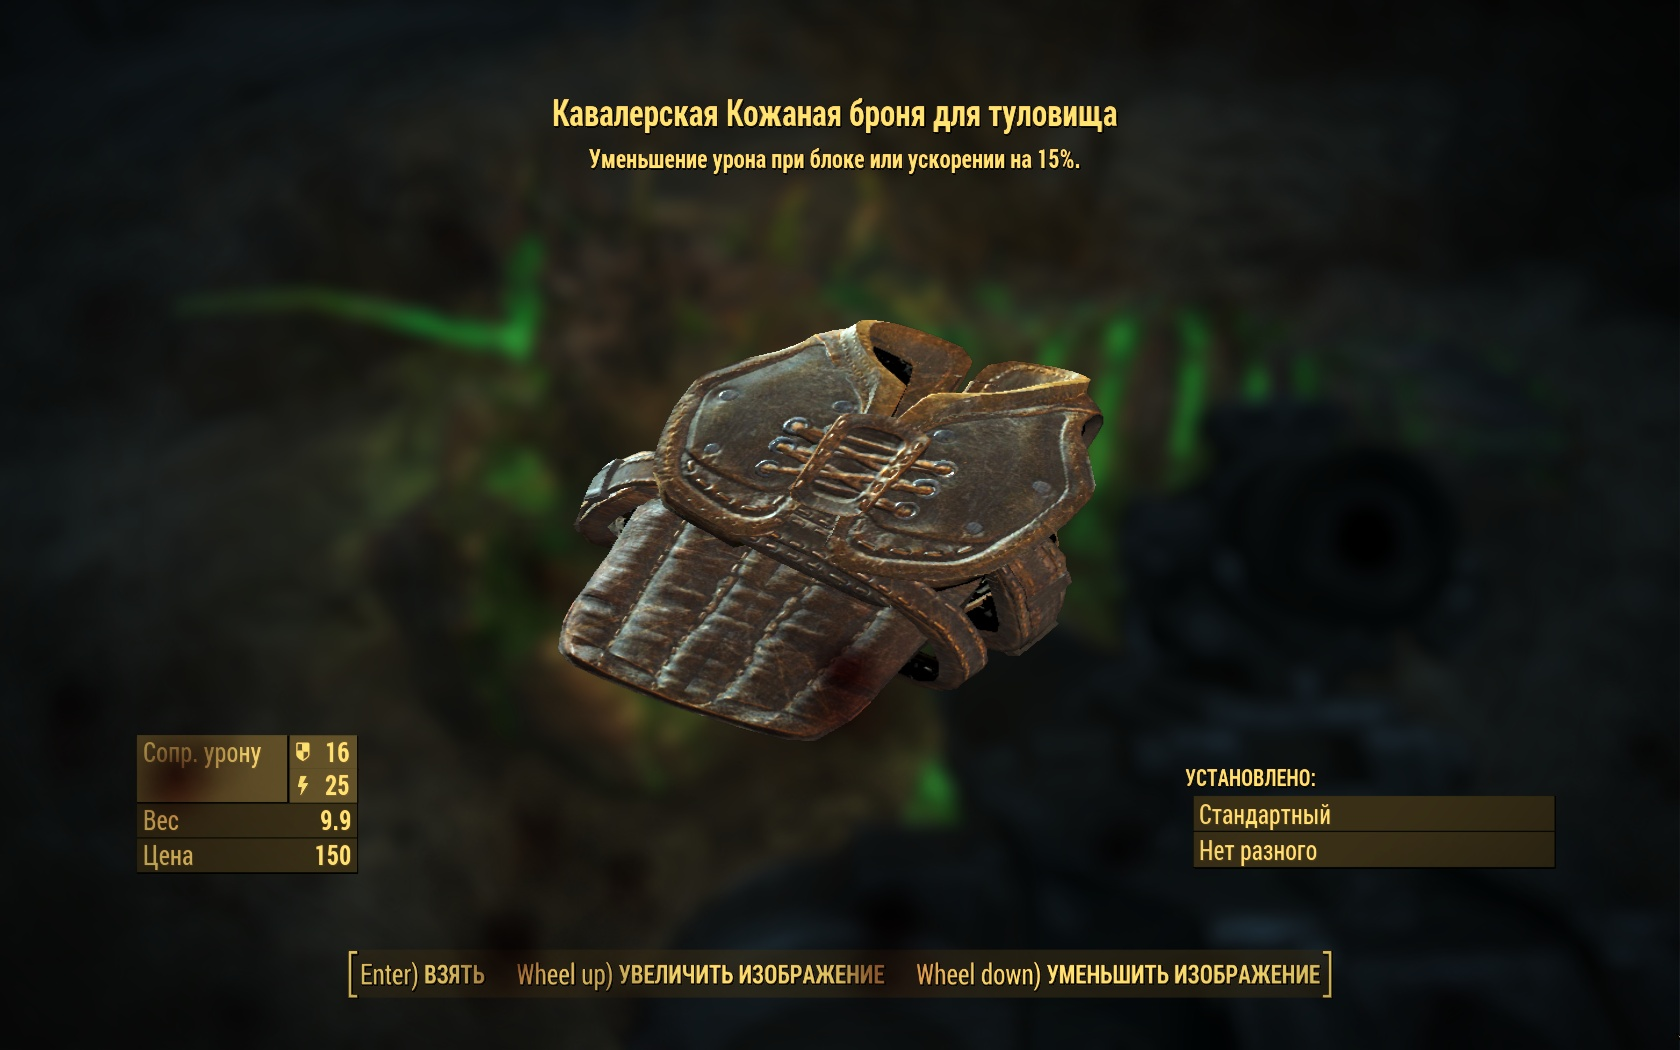 Кавалерская кожаная броня для туловища - Fallout 4 броня, Кавалерская, кожаная, Одежда